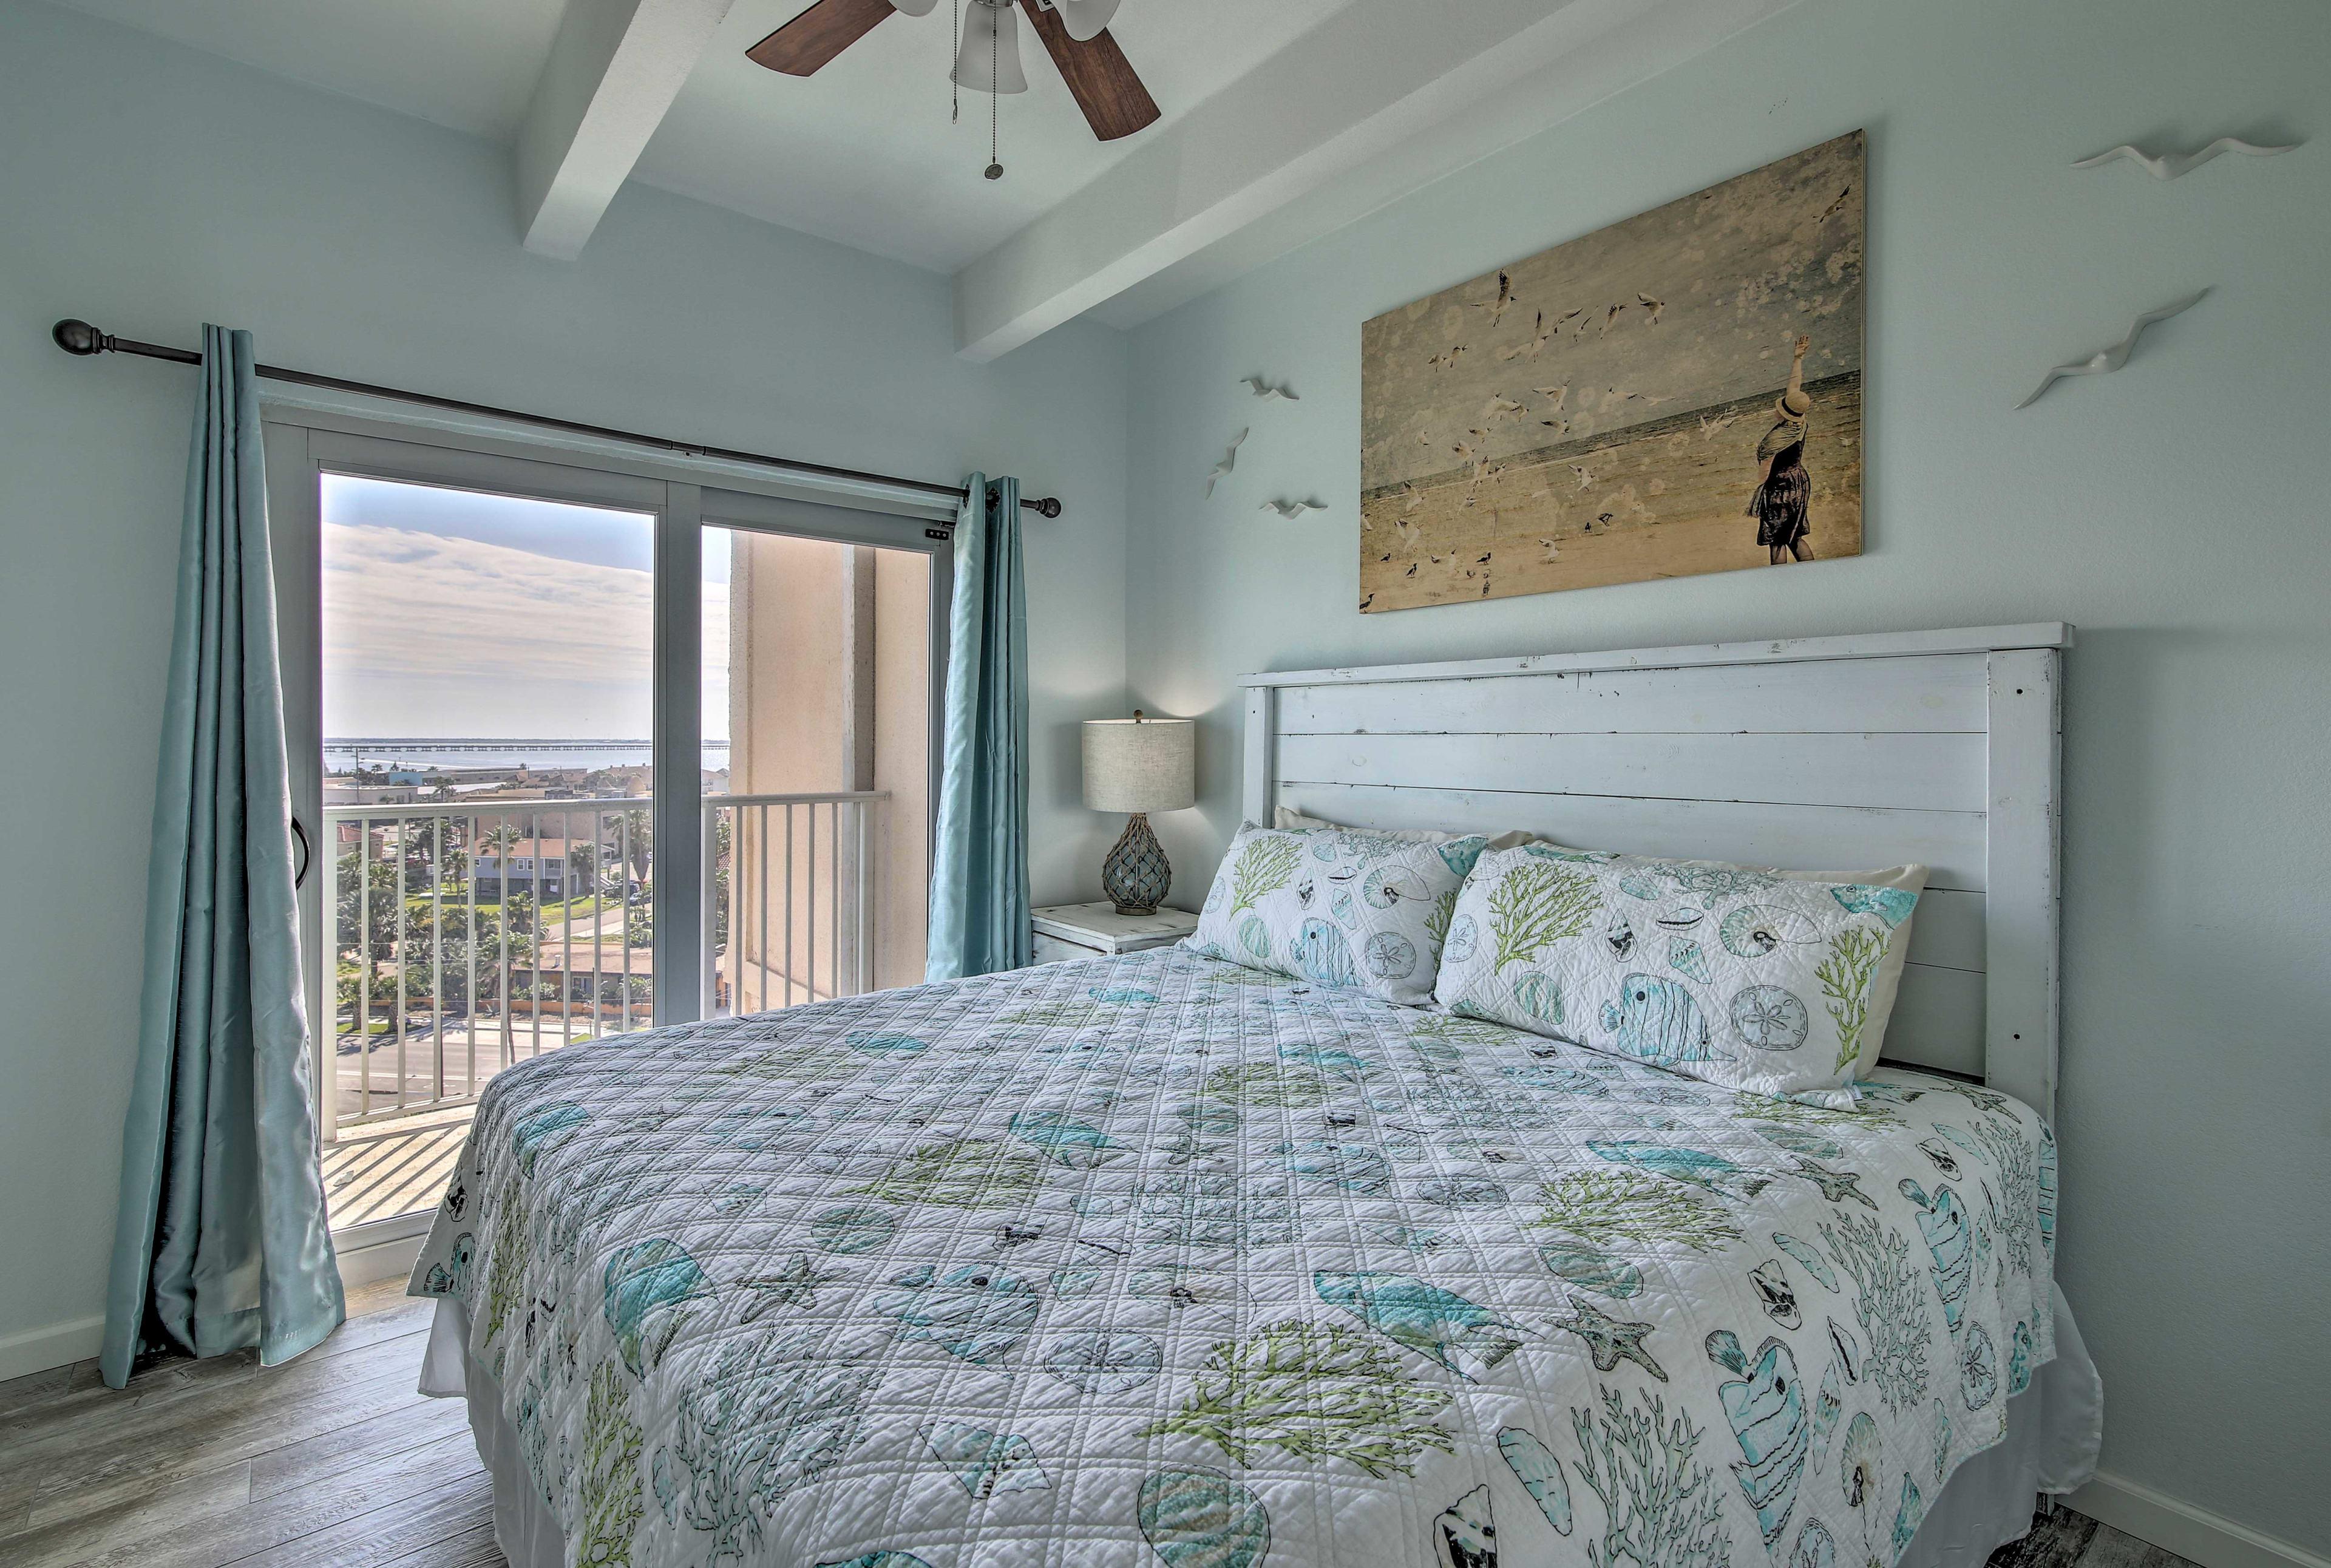 Bedroom 1 | King Bed | Linens Provided | Balcony Access